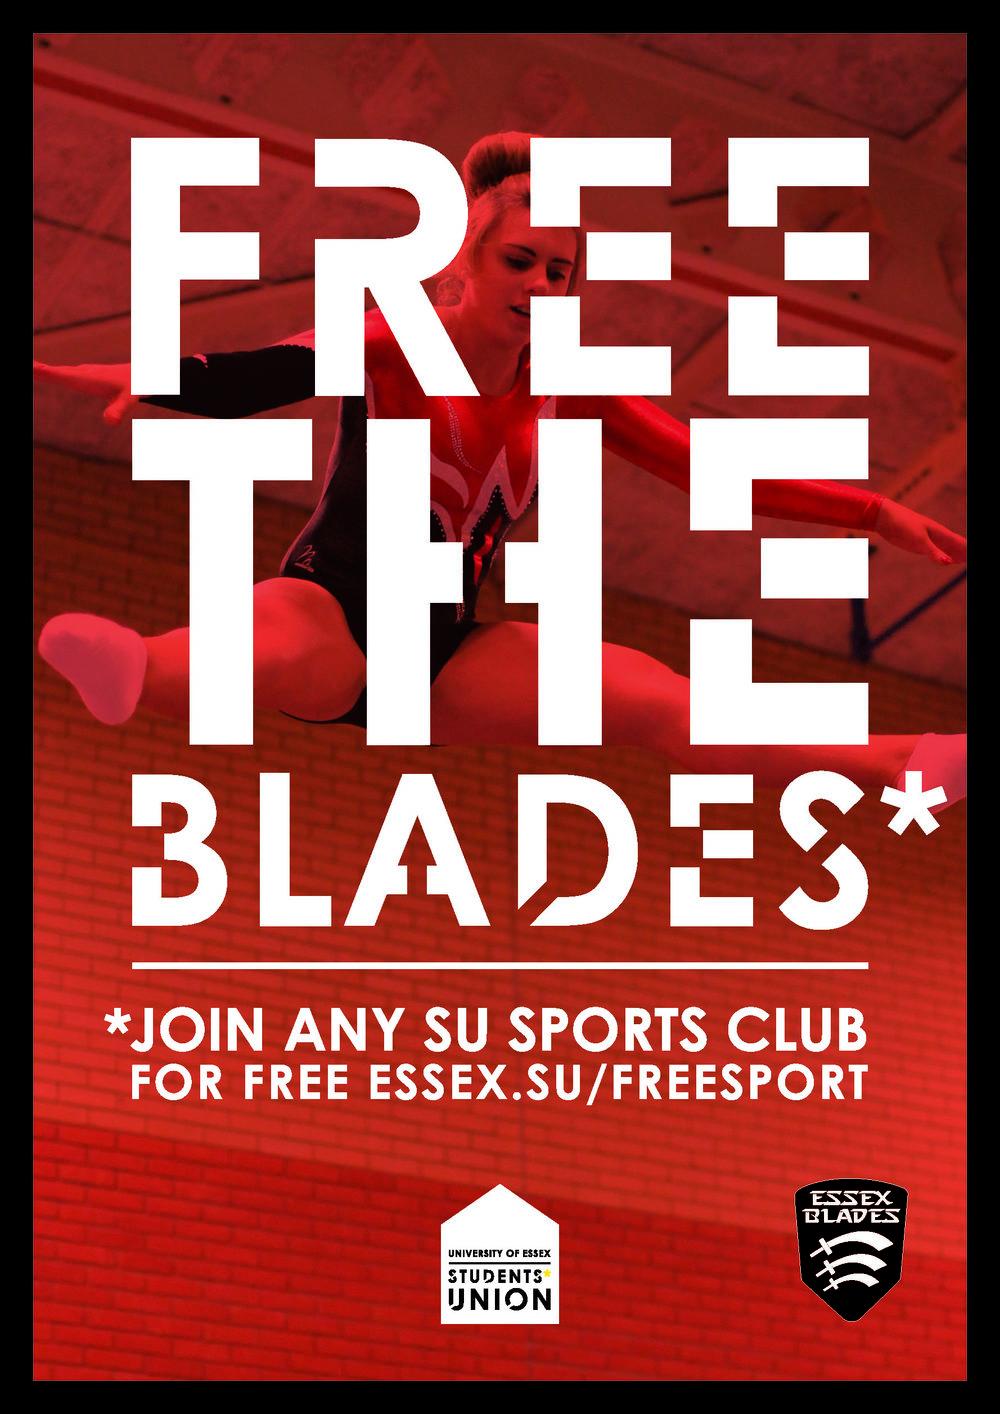 Essex Blades Free Poster v4 [print ready no bleed]_Page_4.jpg